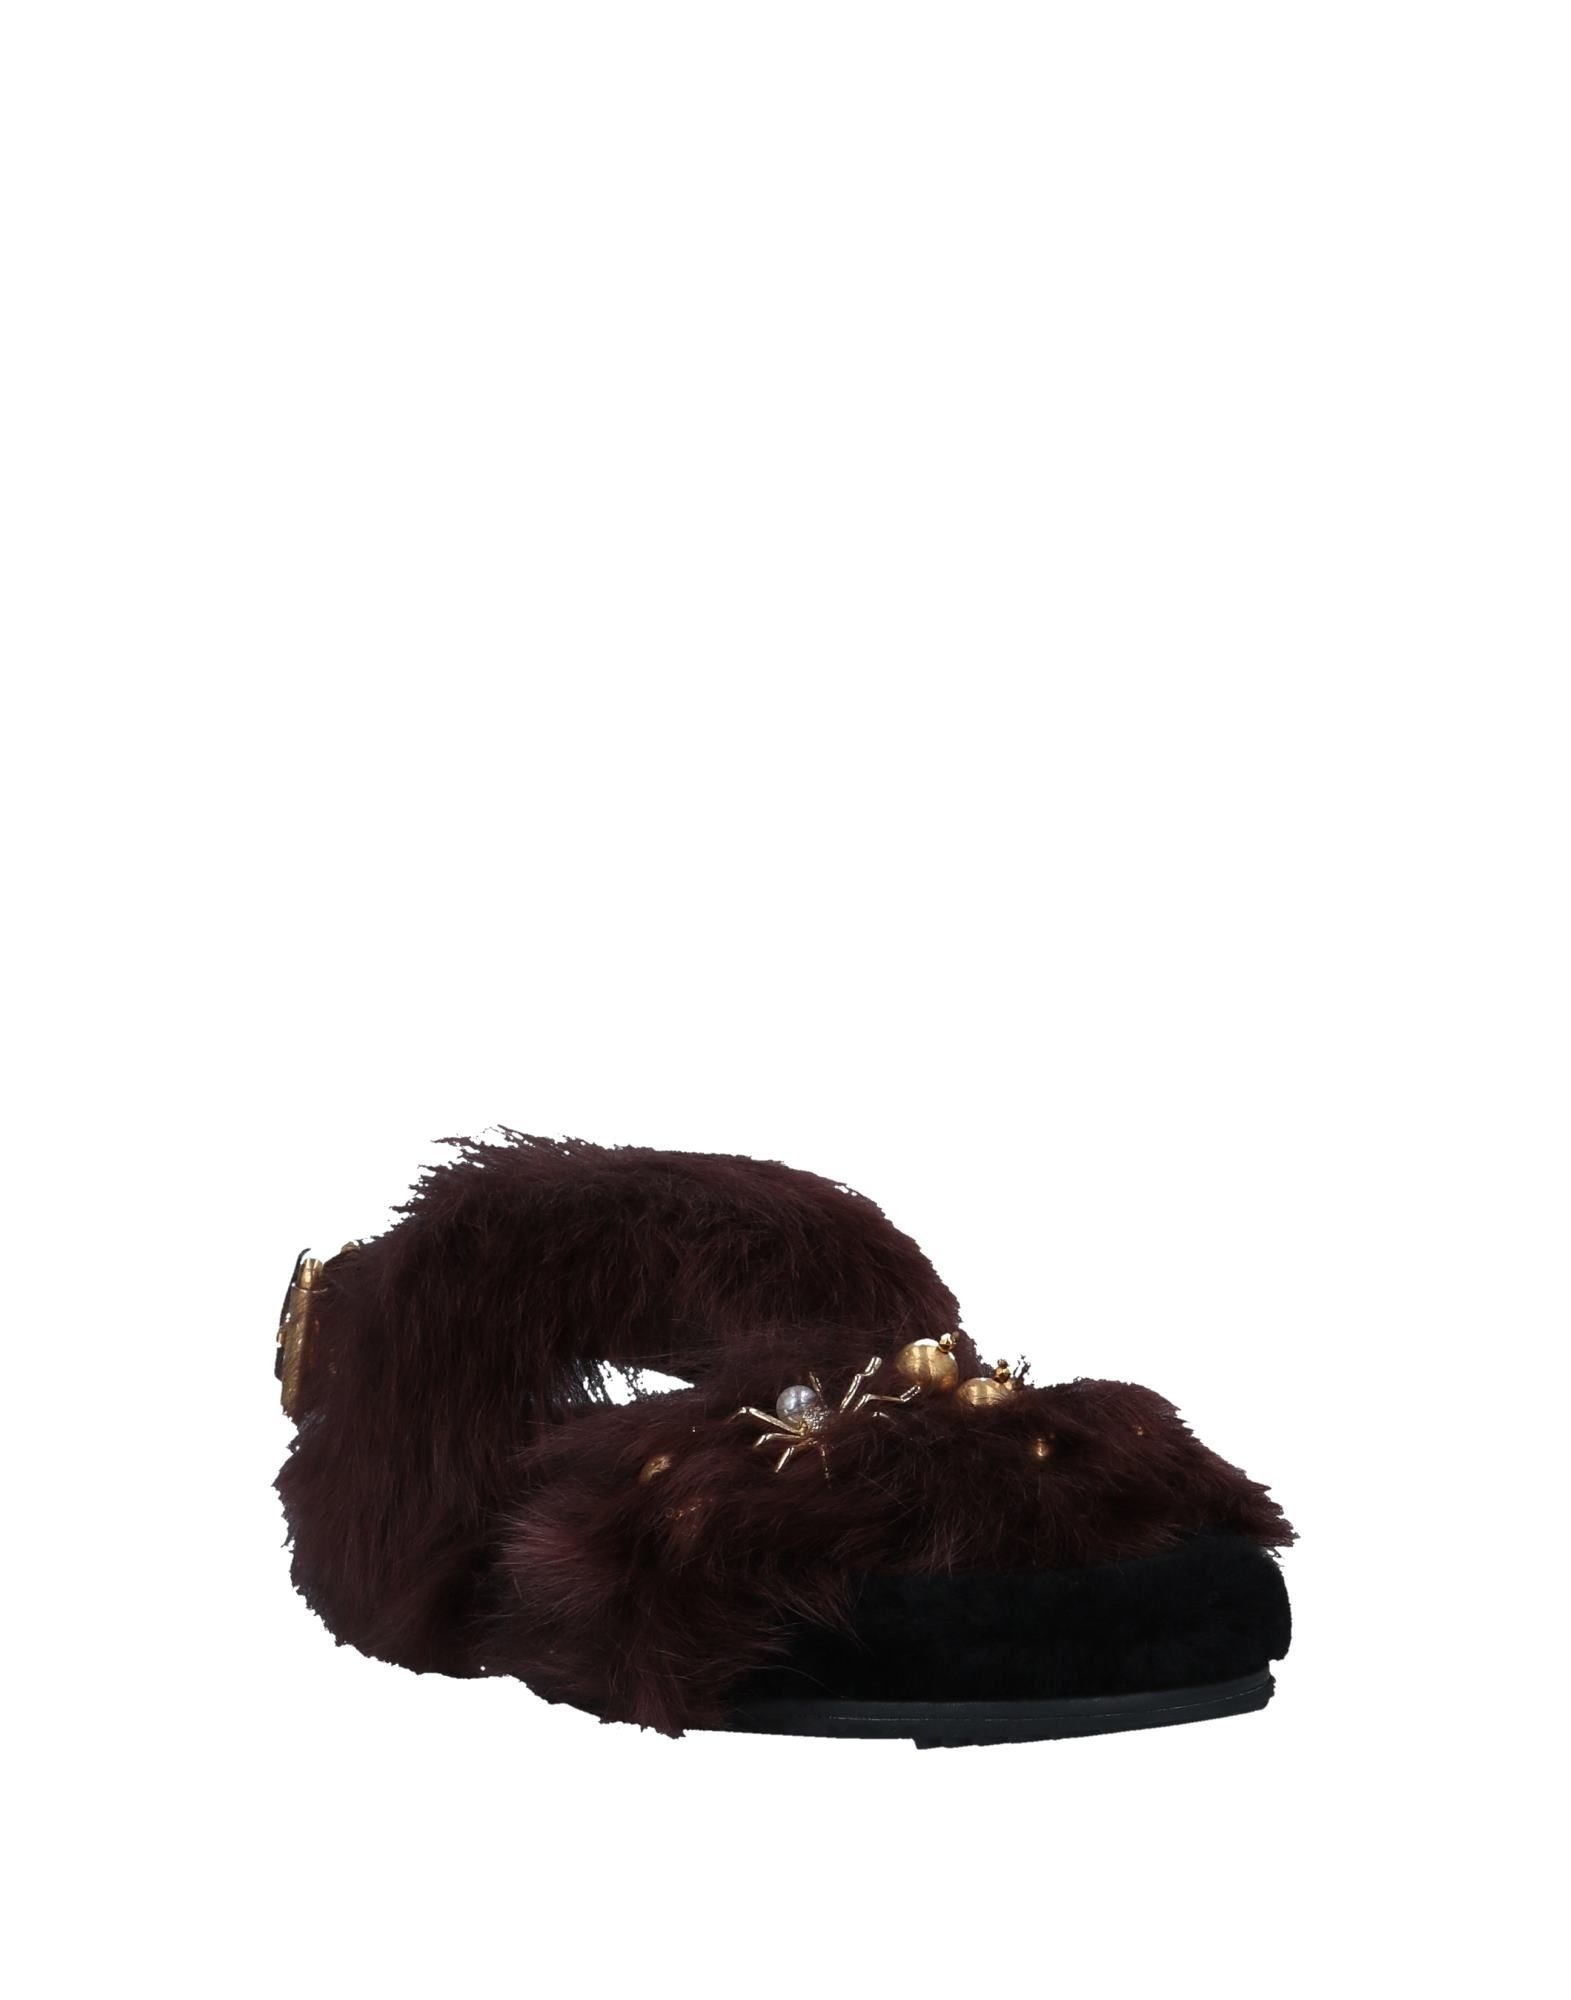 FOOTWEAR Carshoe Cocoa Woman Pelliccia di Pecora